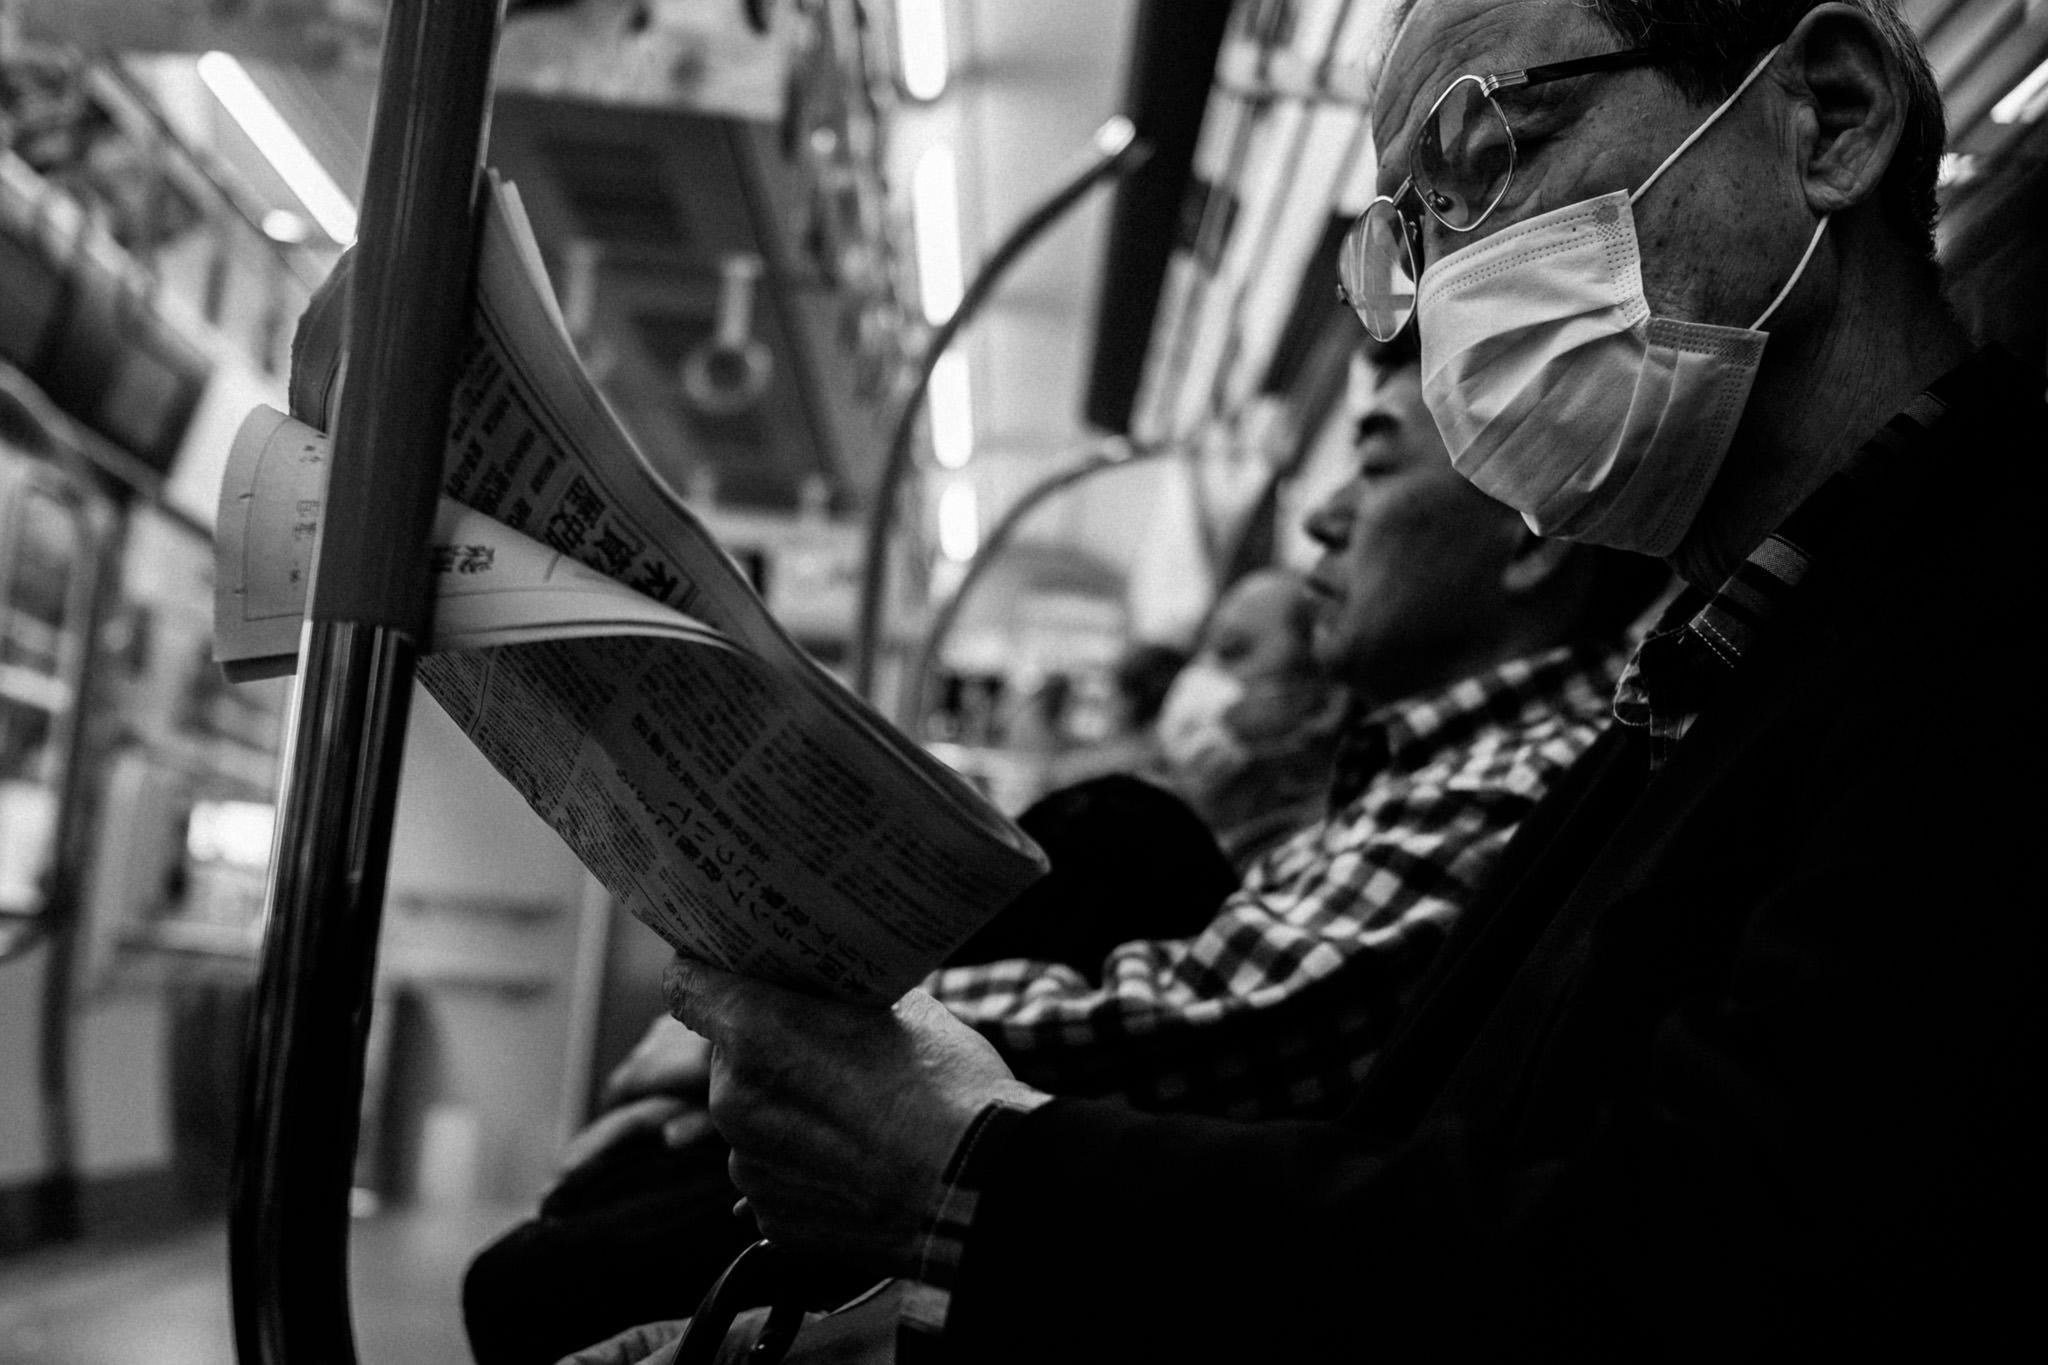 chris_eberhardt_japan_travel_reise_nippon-41.jpg